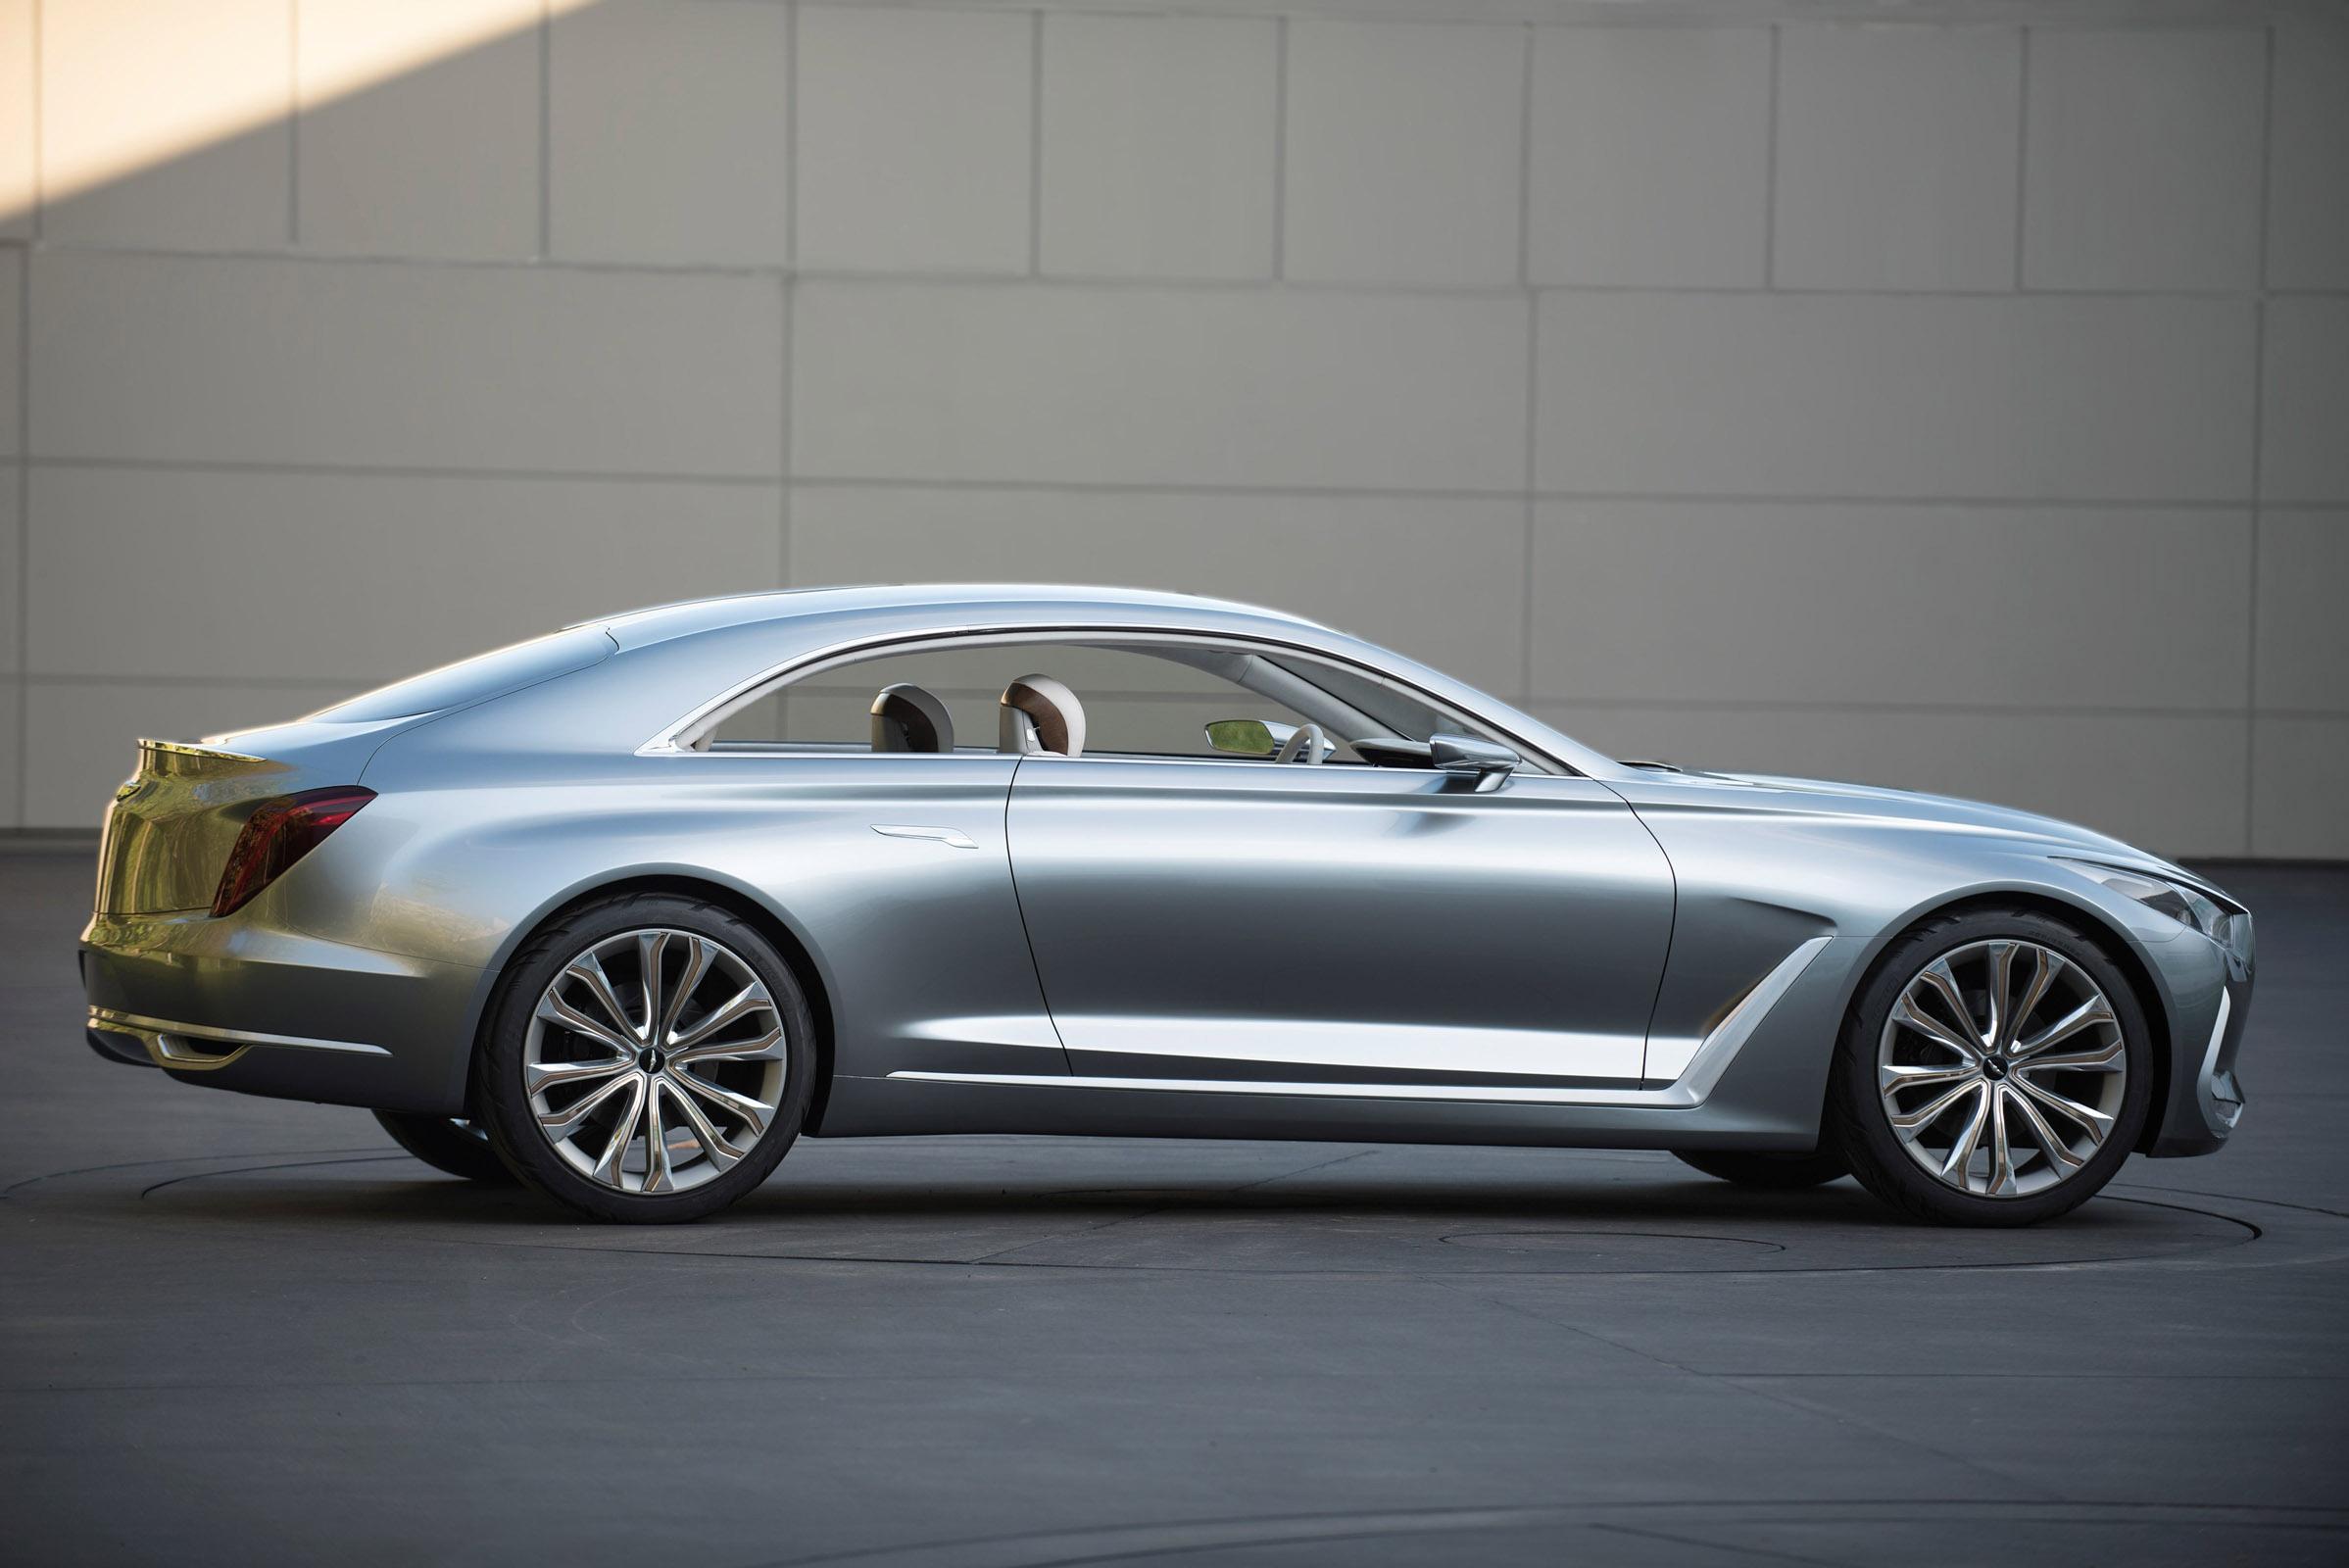 2015 Hyundai Vision G Coupe Concept